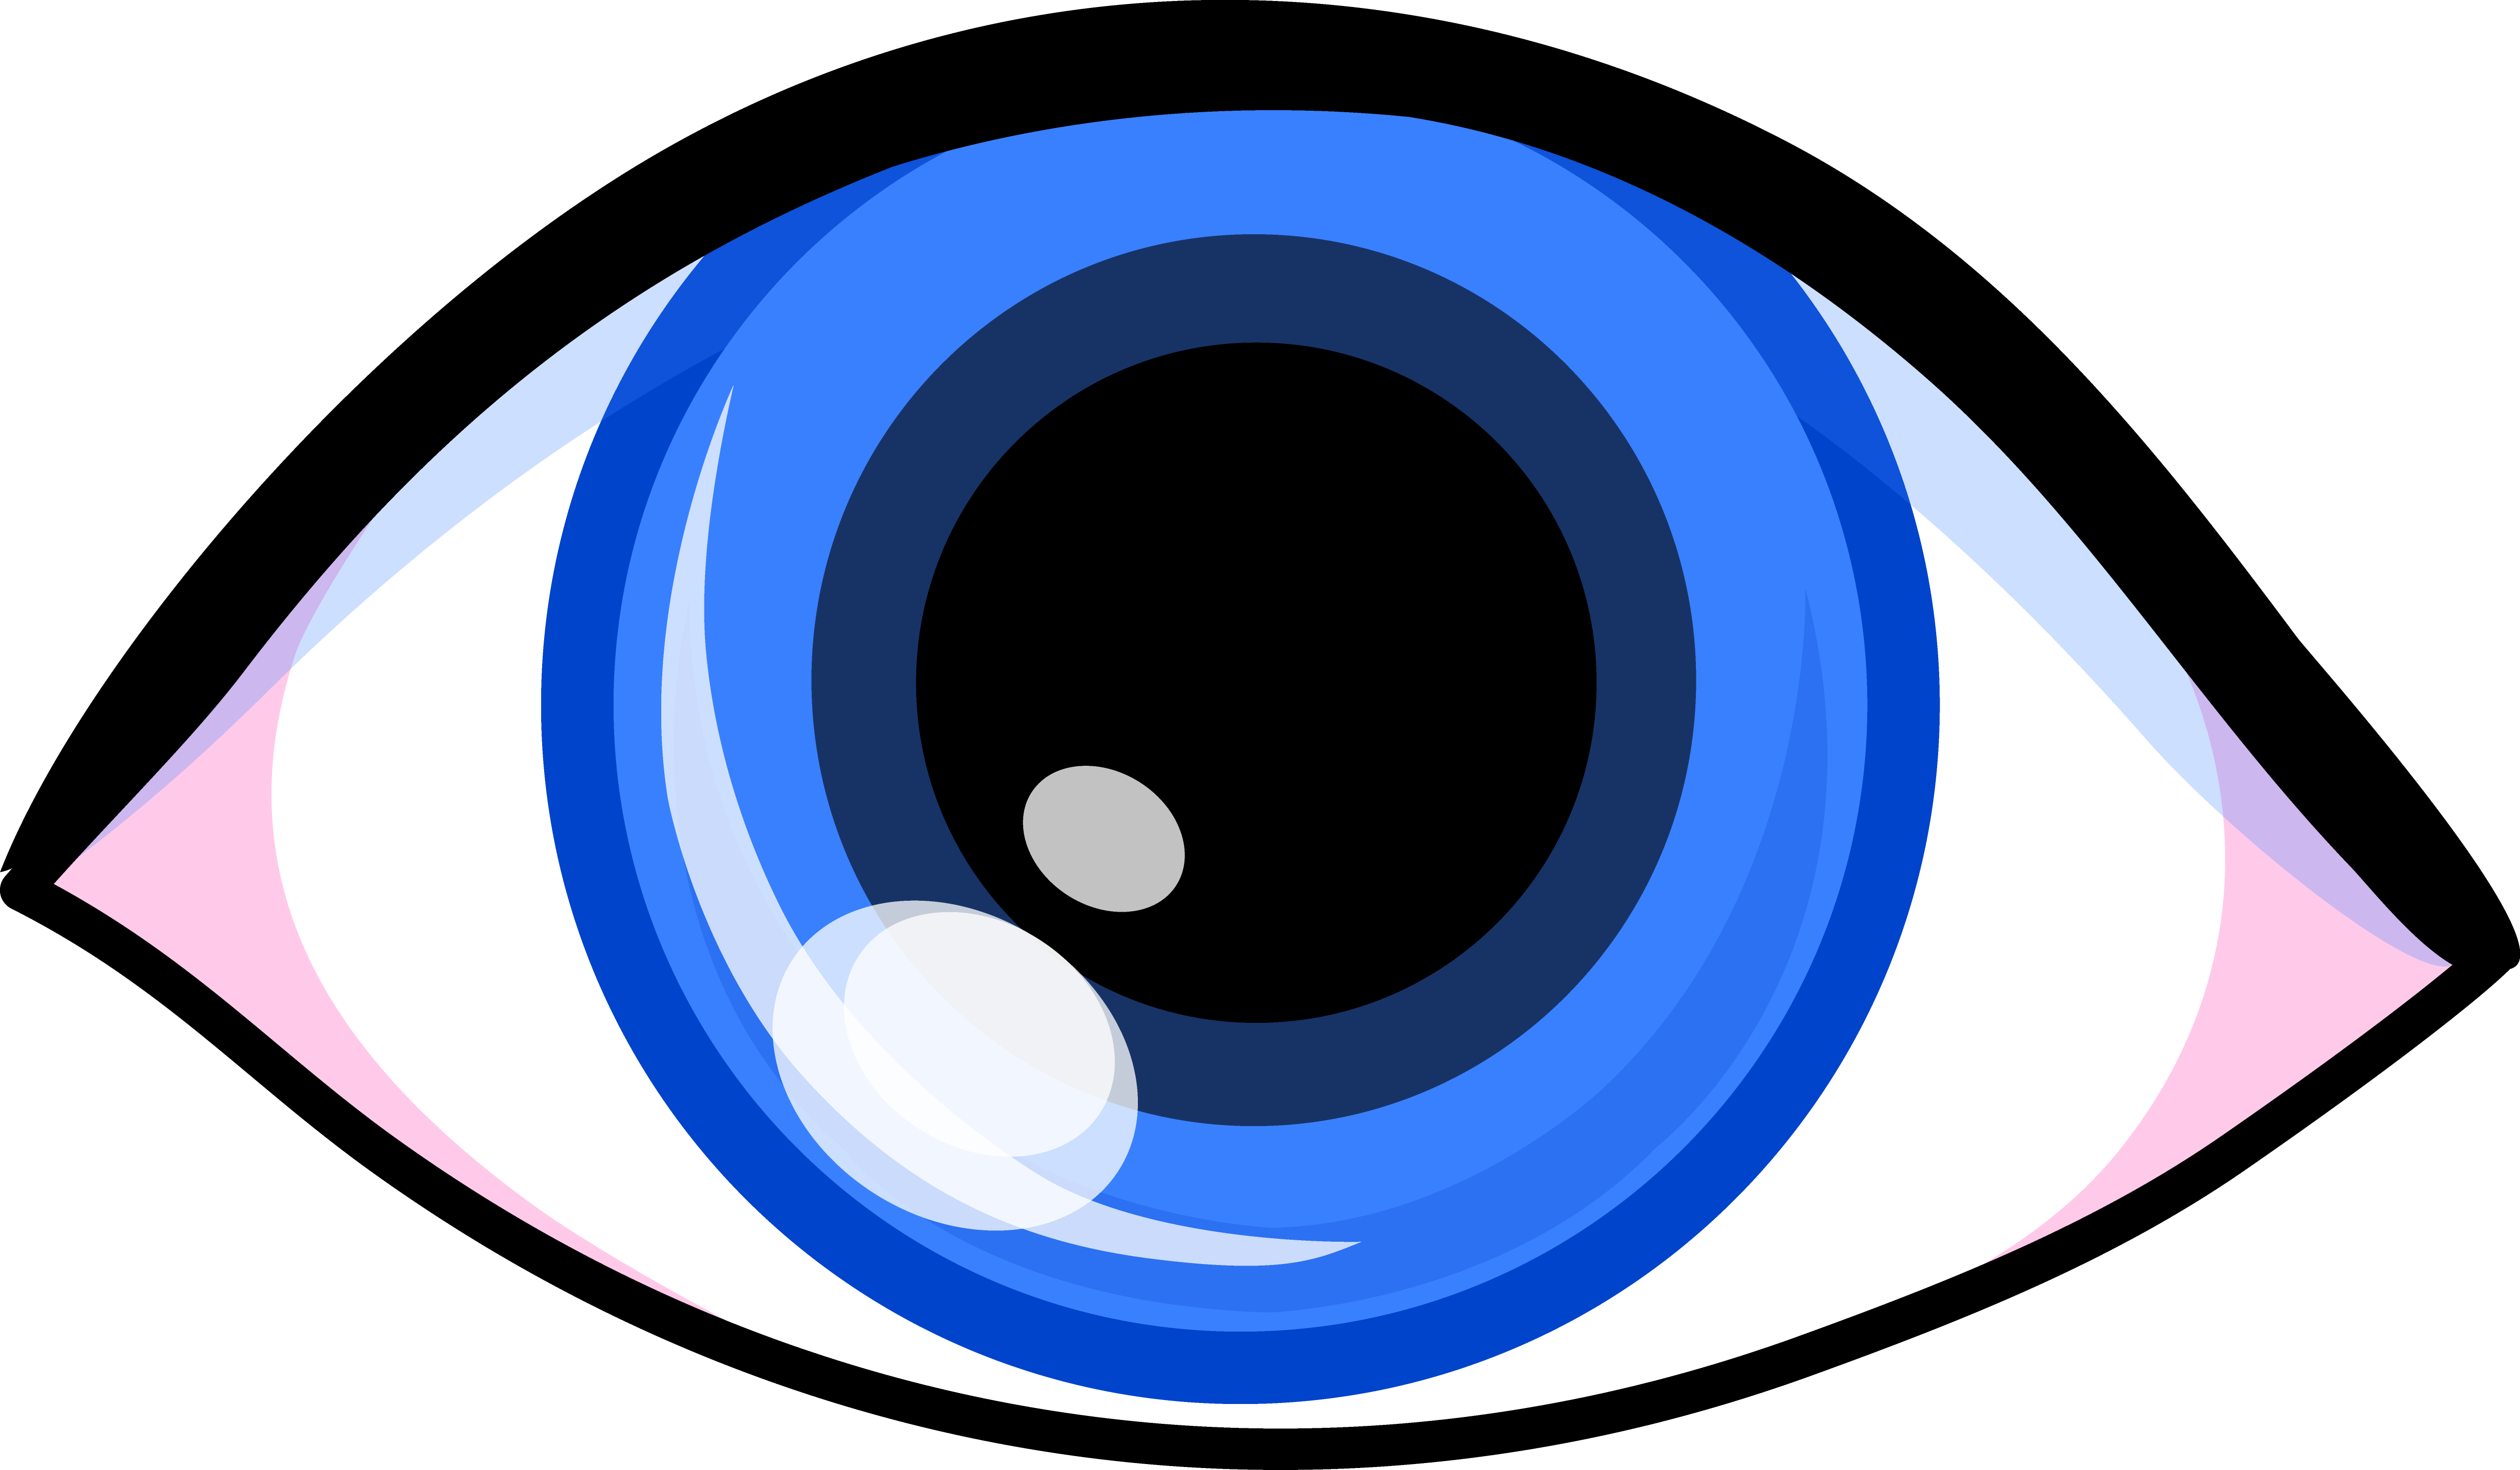 5076x2962 Human Eye Clip Art Clipart Panda